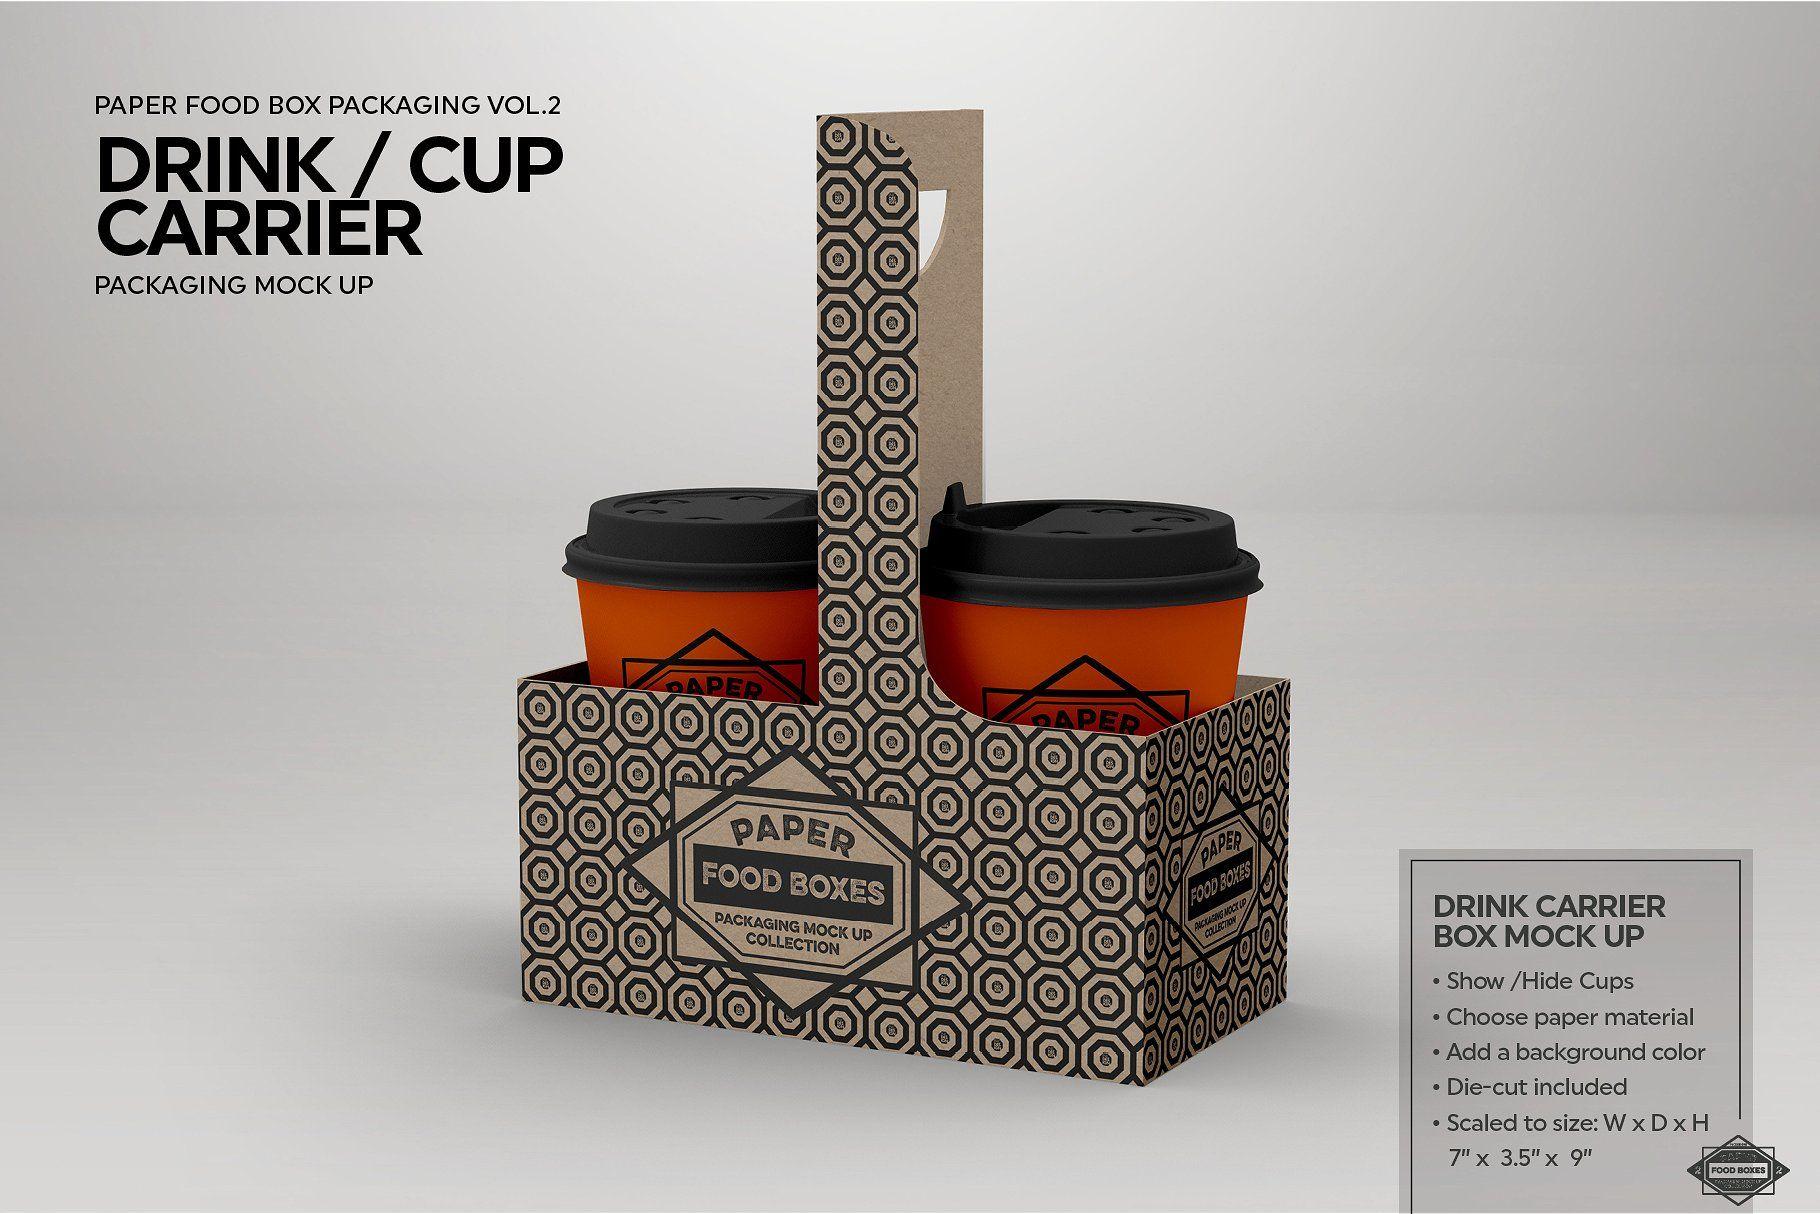 Download Vol 2 Food Box Packaging Mockups Packaging Mockup Free Logo Mockup Psd Mockup Free Psd